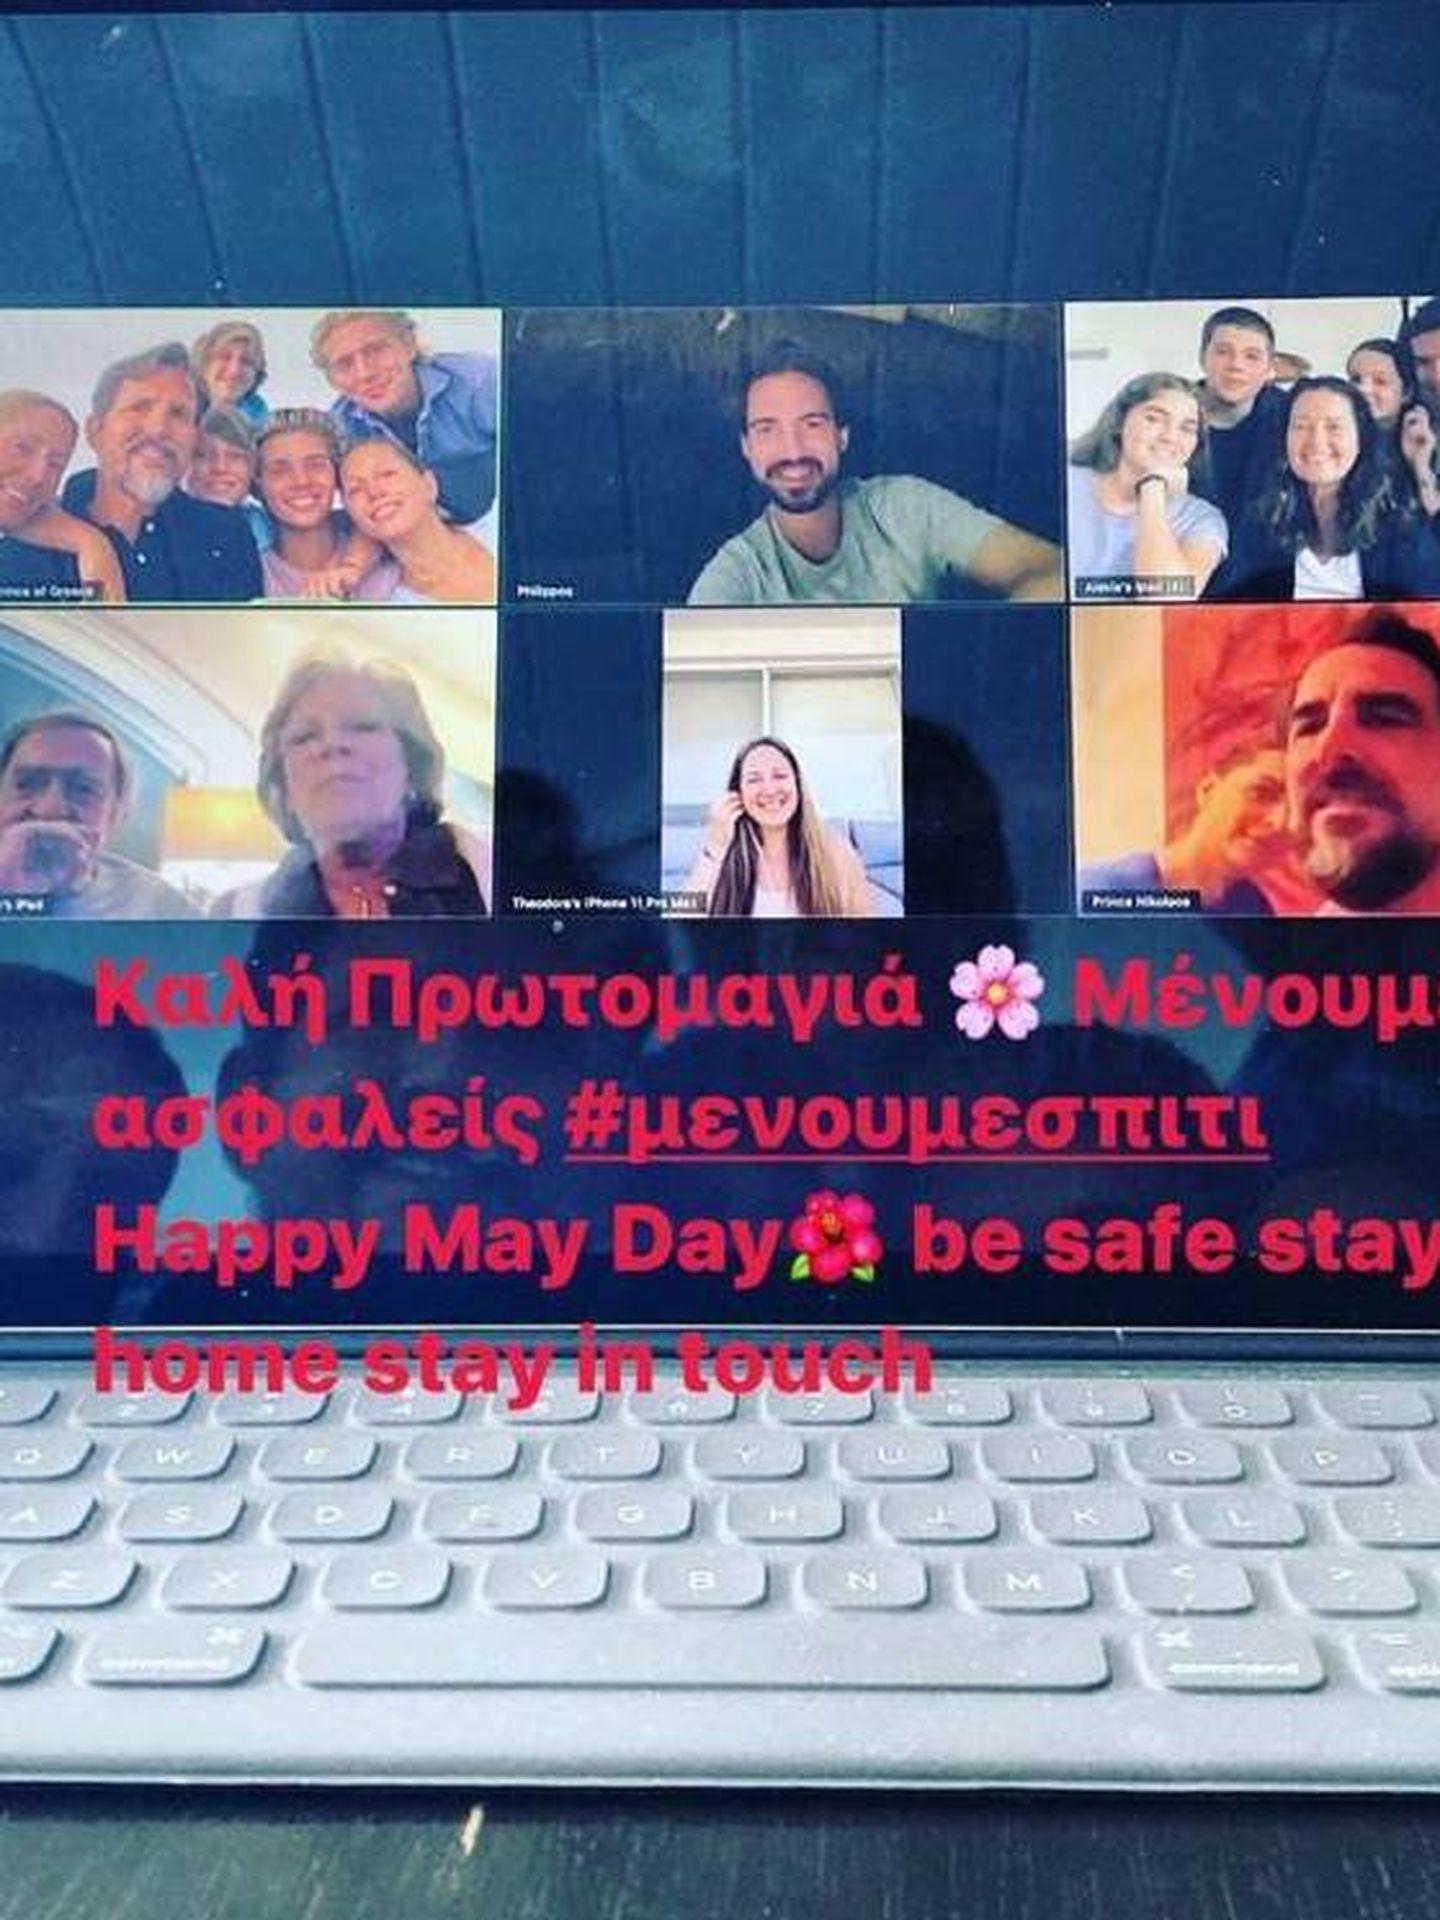 La familia real griega, reunida a través de videollamada. (@pavlosgreece)